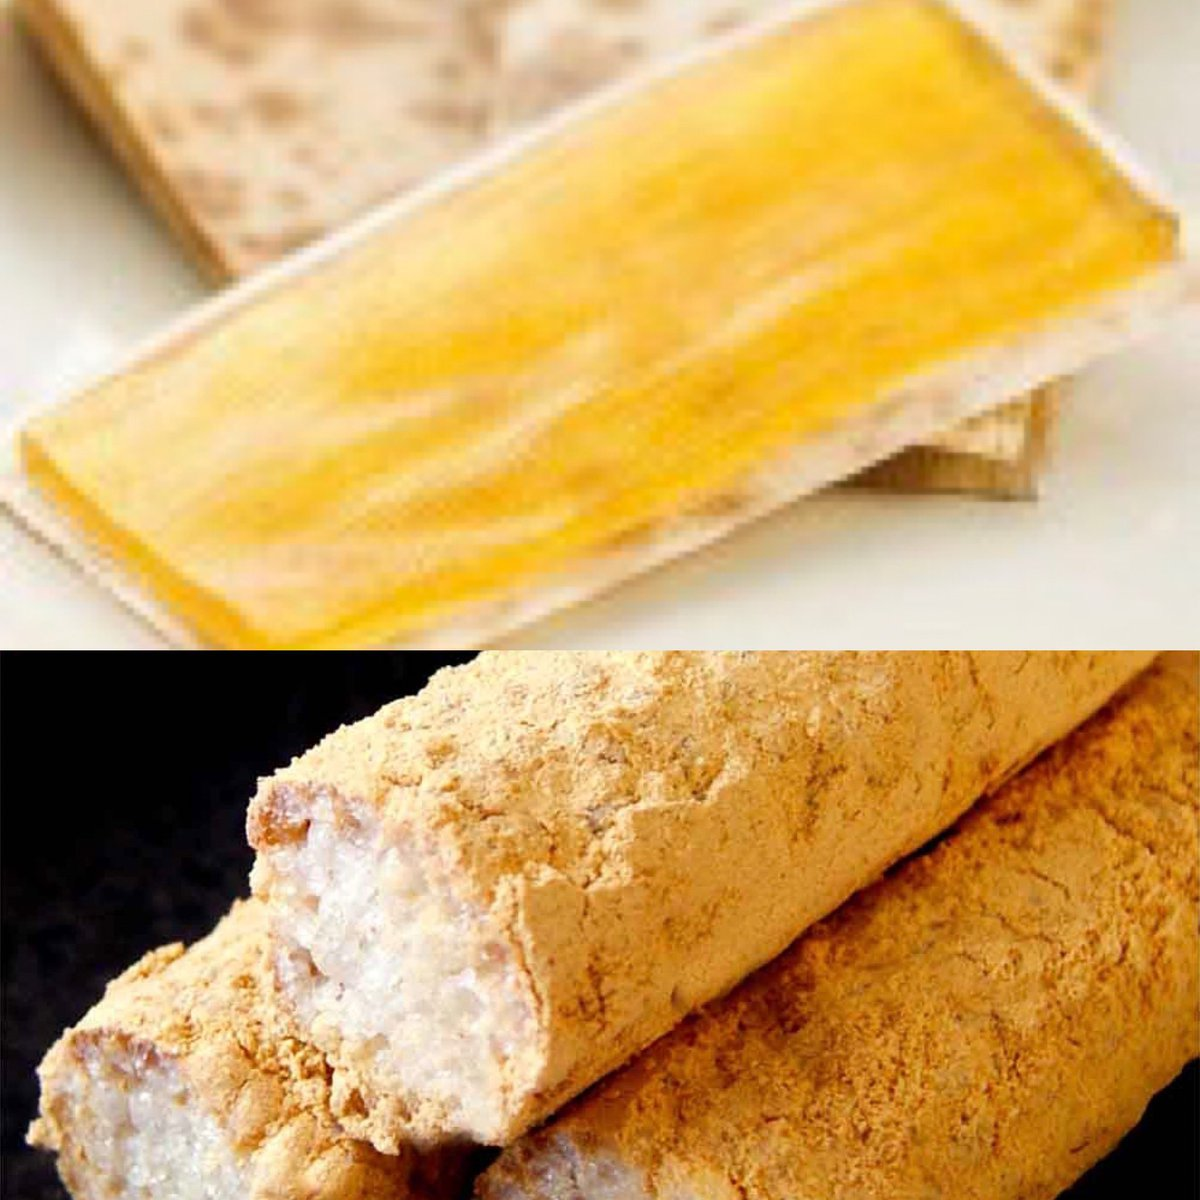 test ツイッターメディア - #秘密のケンミンSHOW極 #山形 #冷たい肉そば #茨城県 #水戸 #亀屋製菓 #のし梅 #吉原殿中  ケンミンSHOW観ていたら地元の物が食べたくなった。 和菓子やけど後でお取り寄せ。 はよ食べたい。50 代のオッサンにとってはのし梅と吉原殿中。 https://t.co/itQkTYXxYB